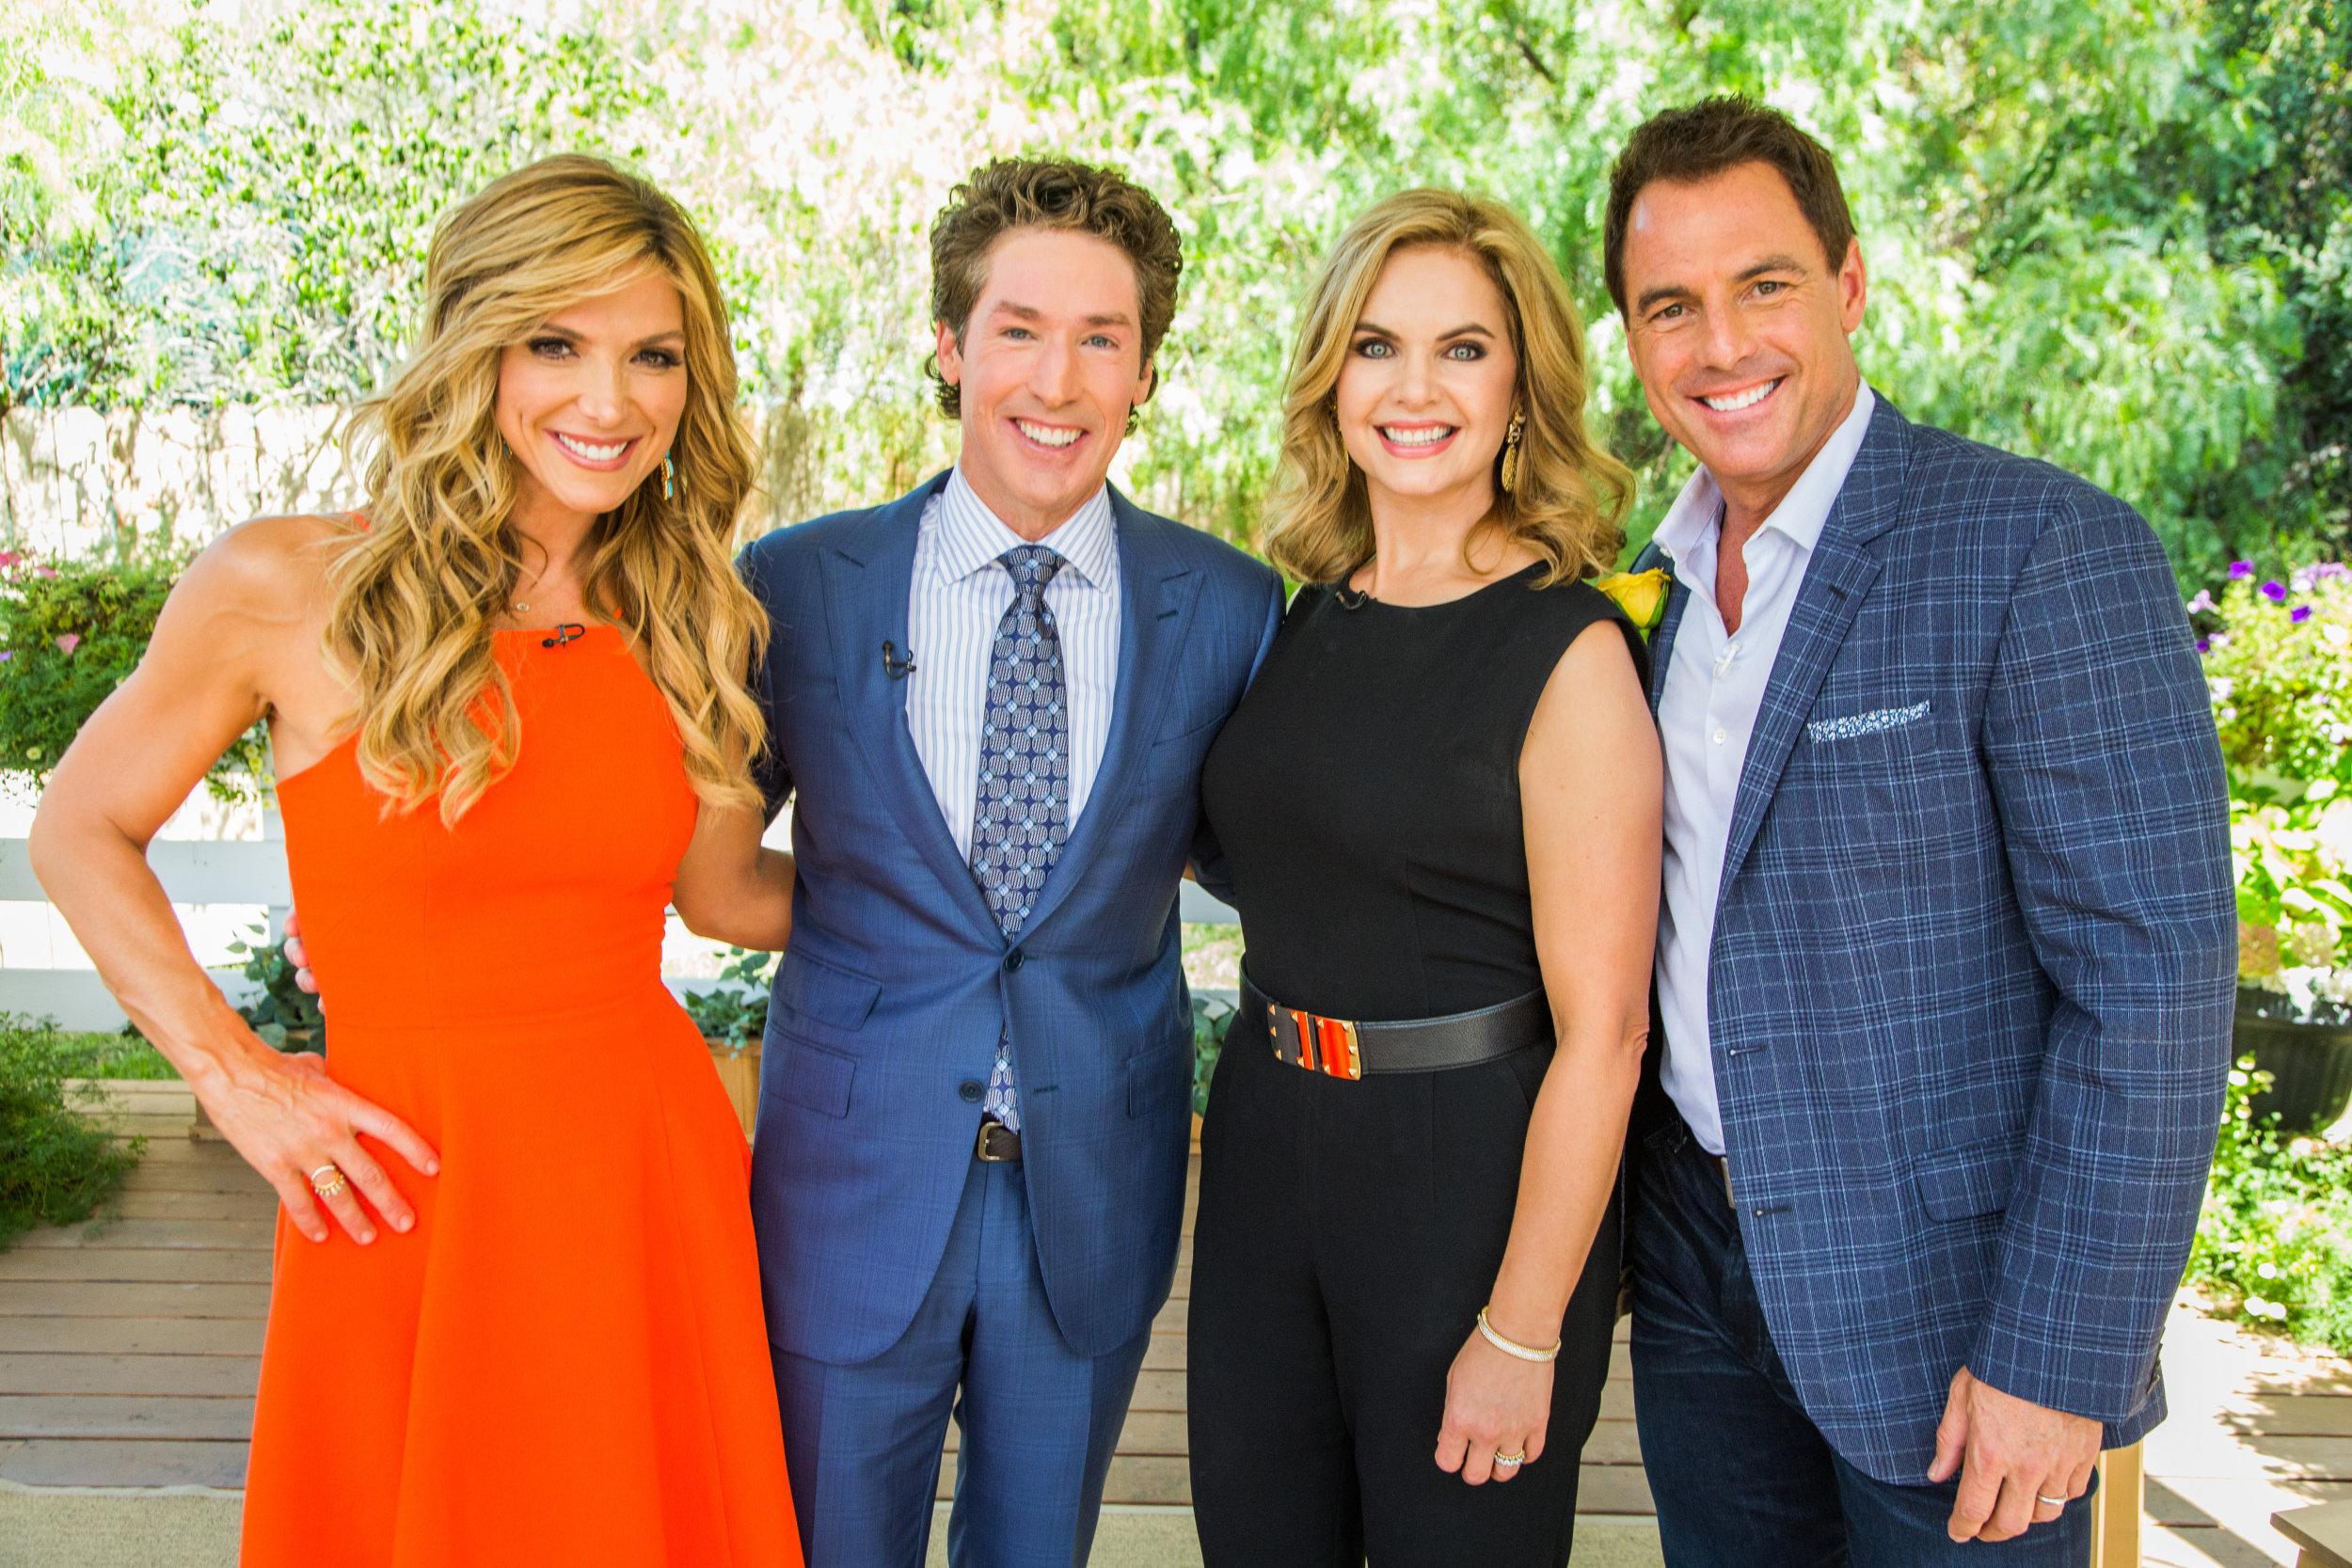 Home & Family - Season 4 Episode Guide | Hallmark Channel